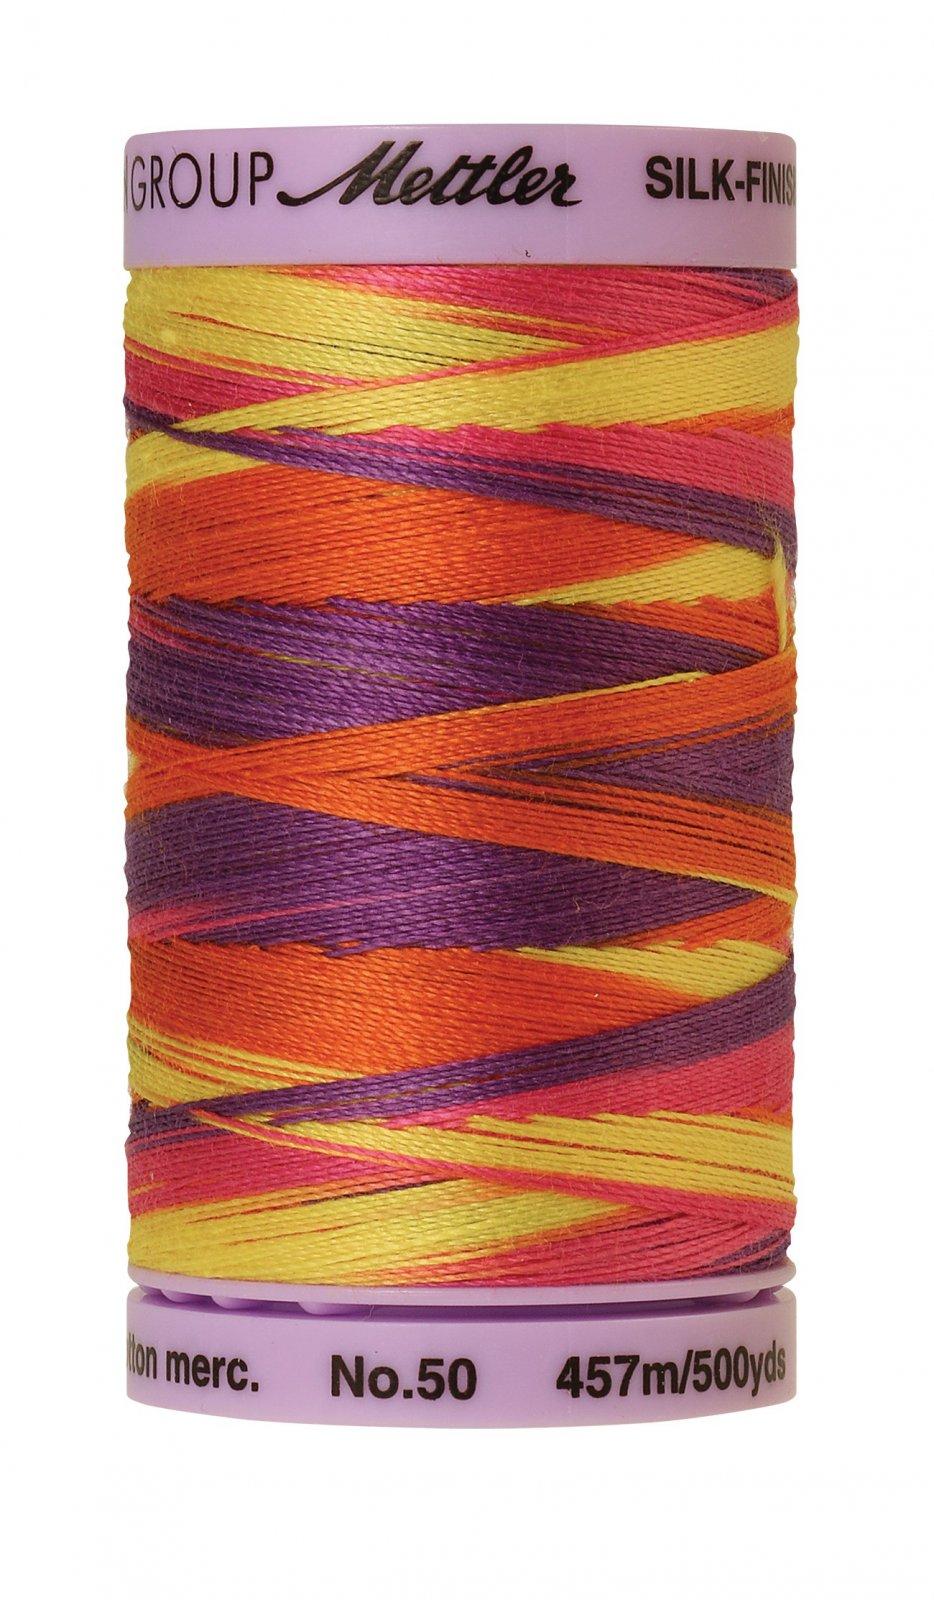 Silk-Finish 50wt Variegated Cotton Thread 457M/500yd Smiley Mix